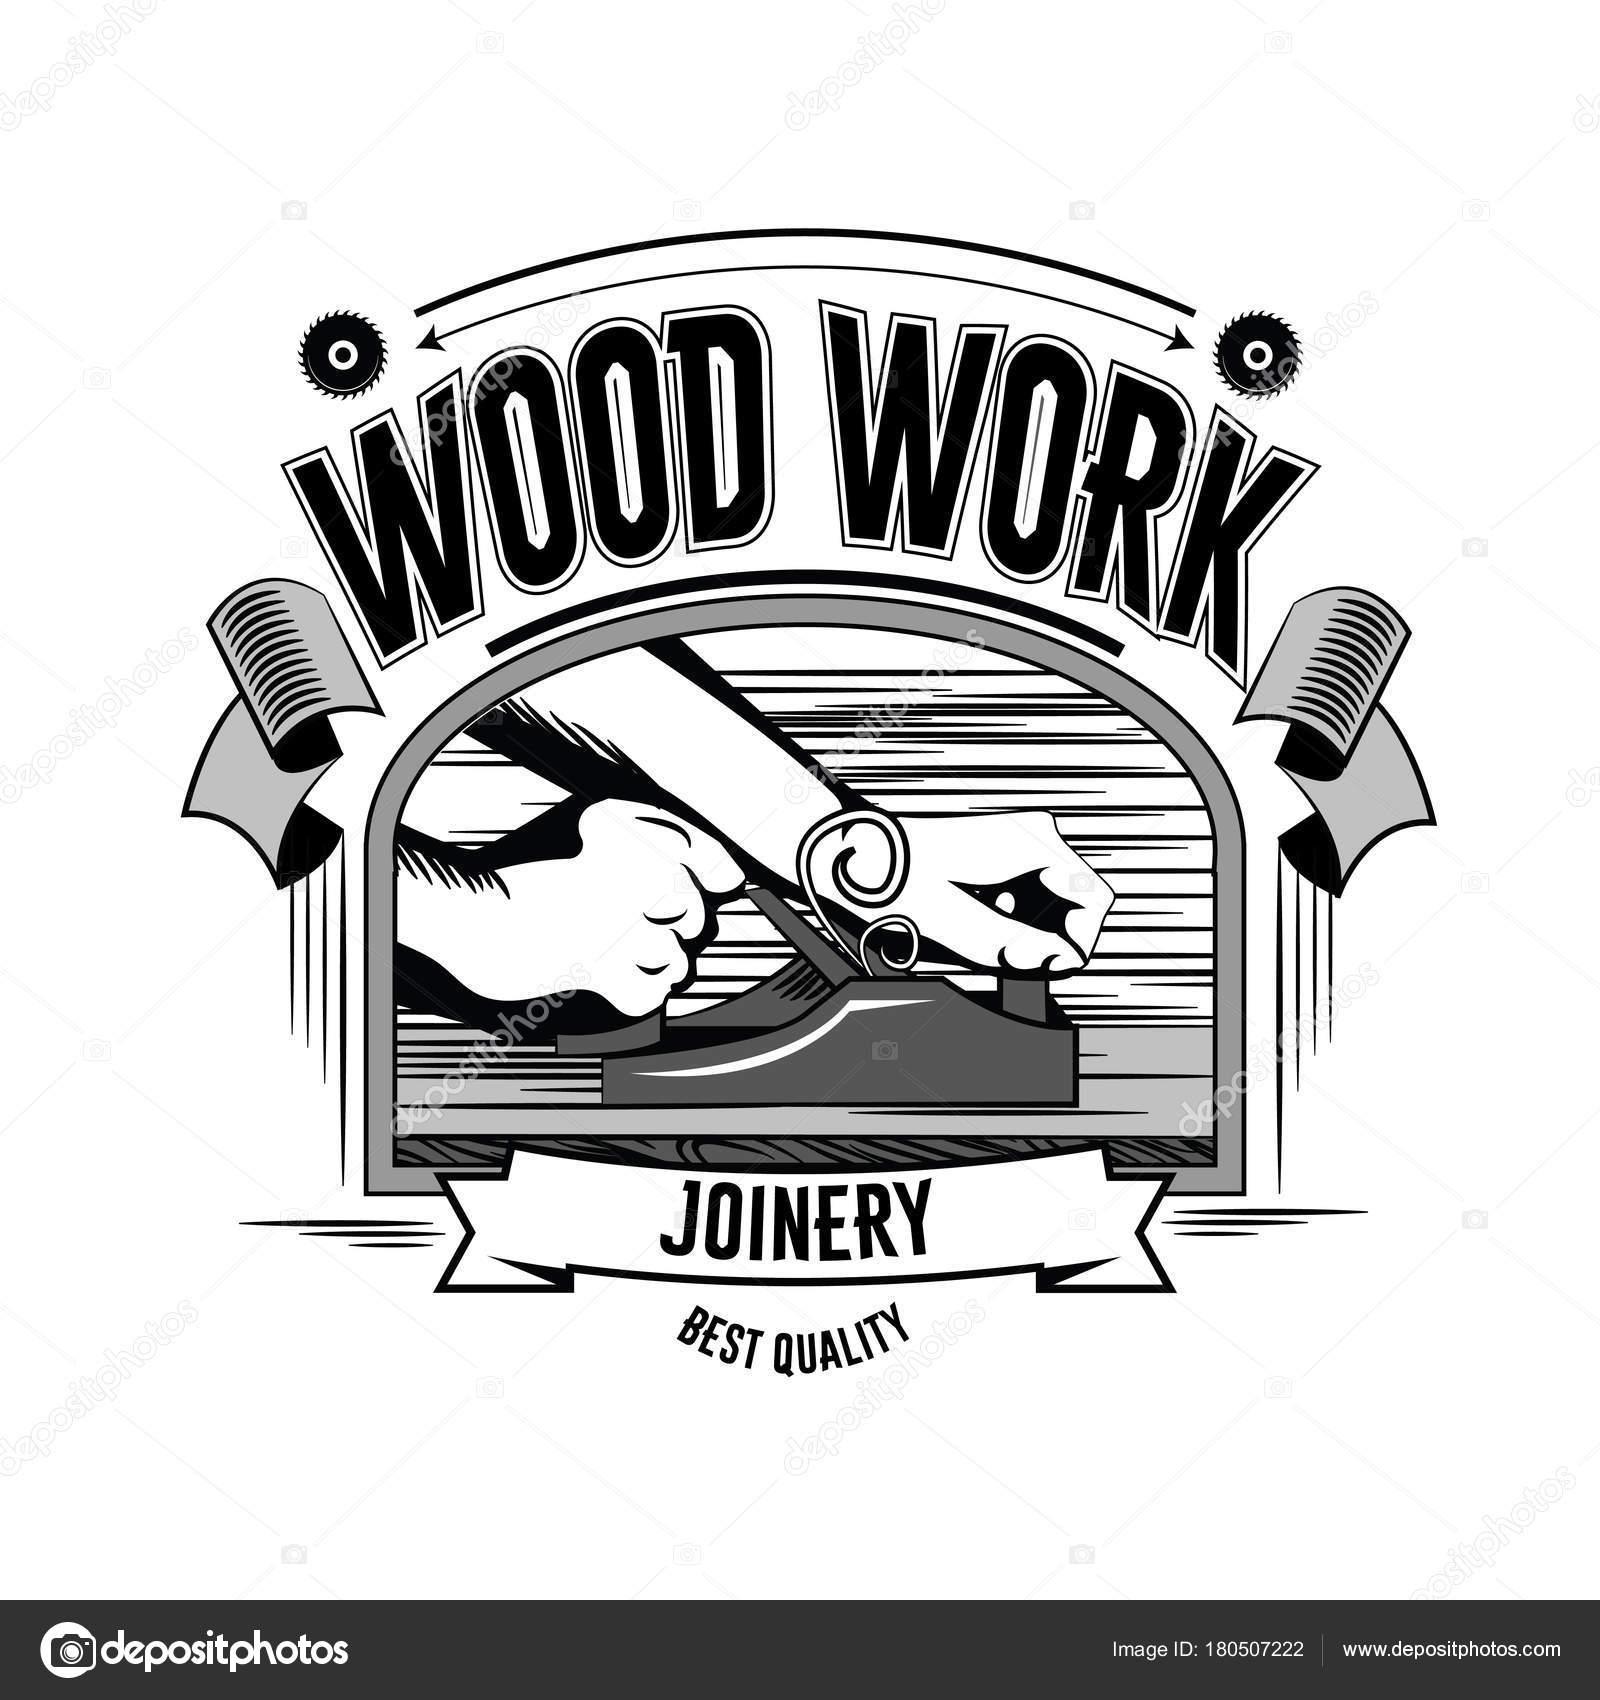 Wood Work Vintage Carpentry Tools Label And Design Element